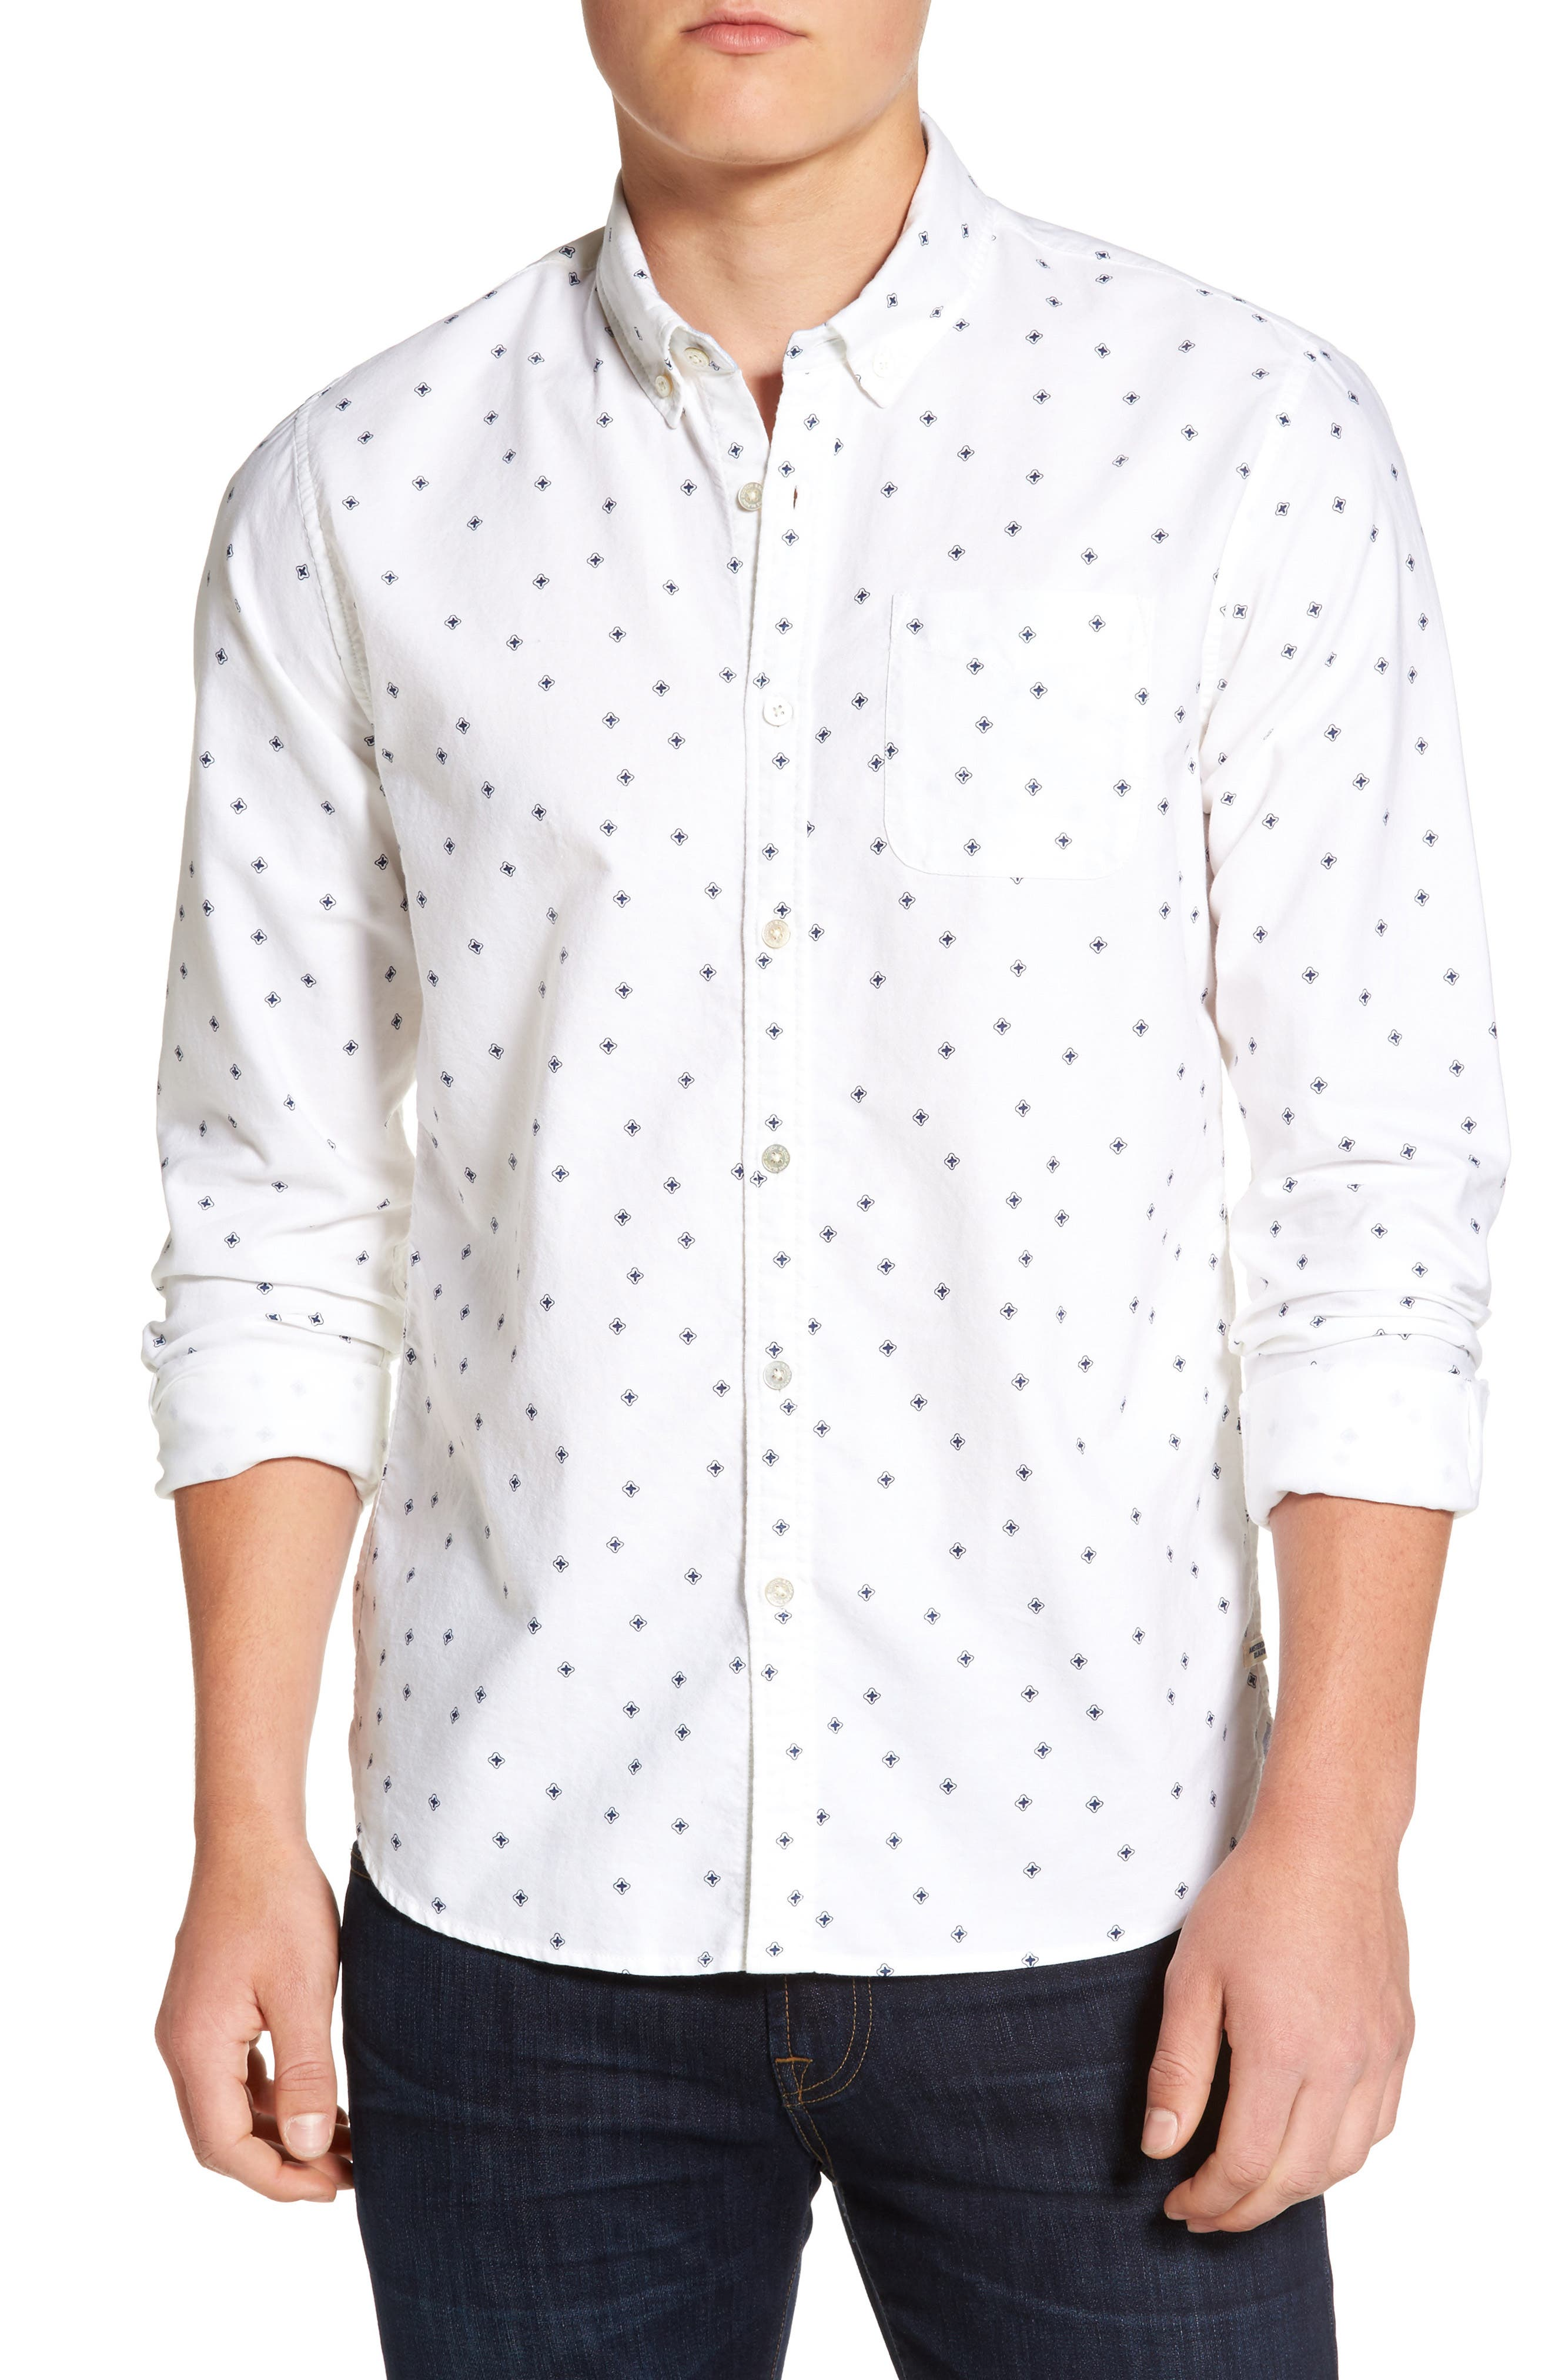 Scotch & Soda Slim Fit Allover Print Shirt